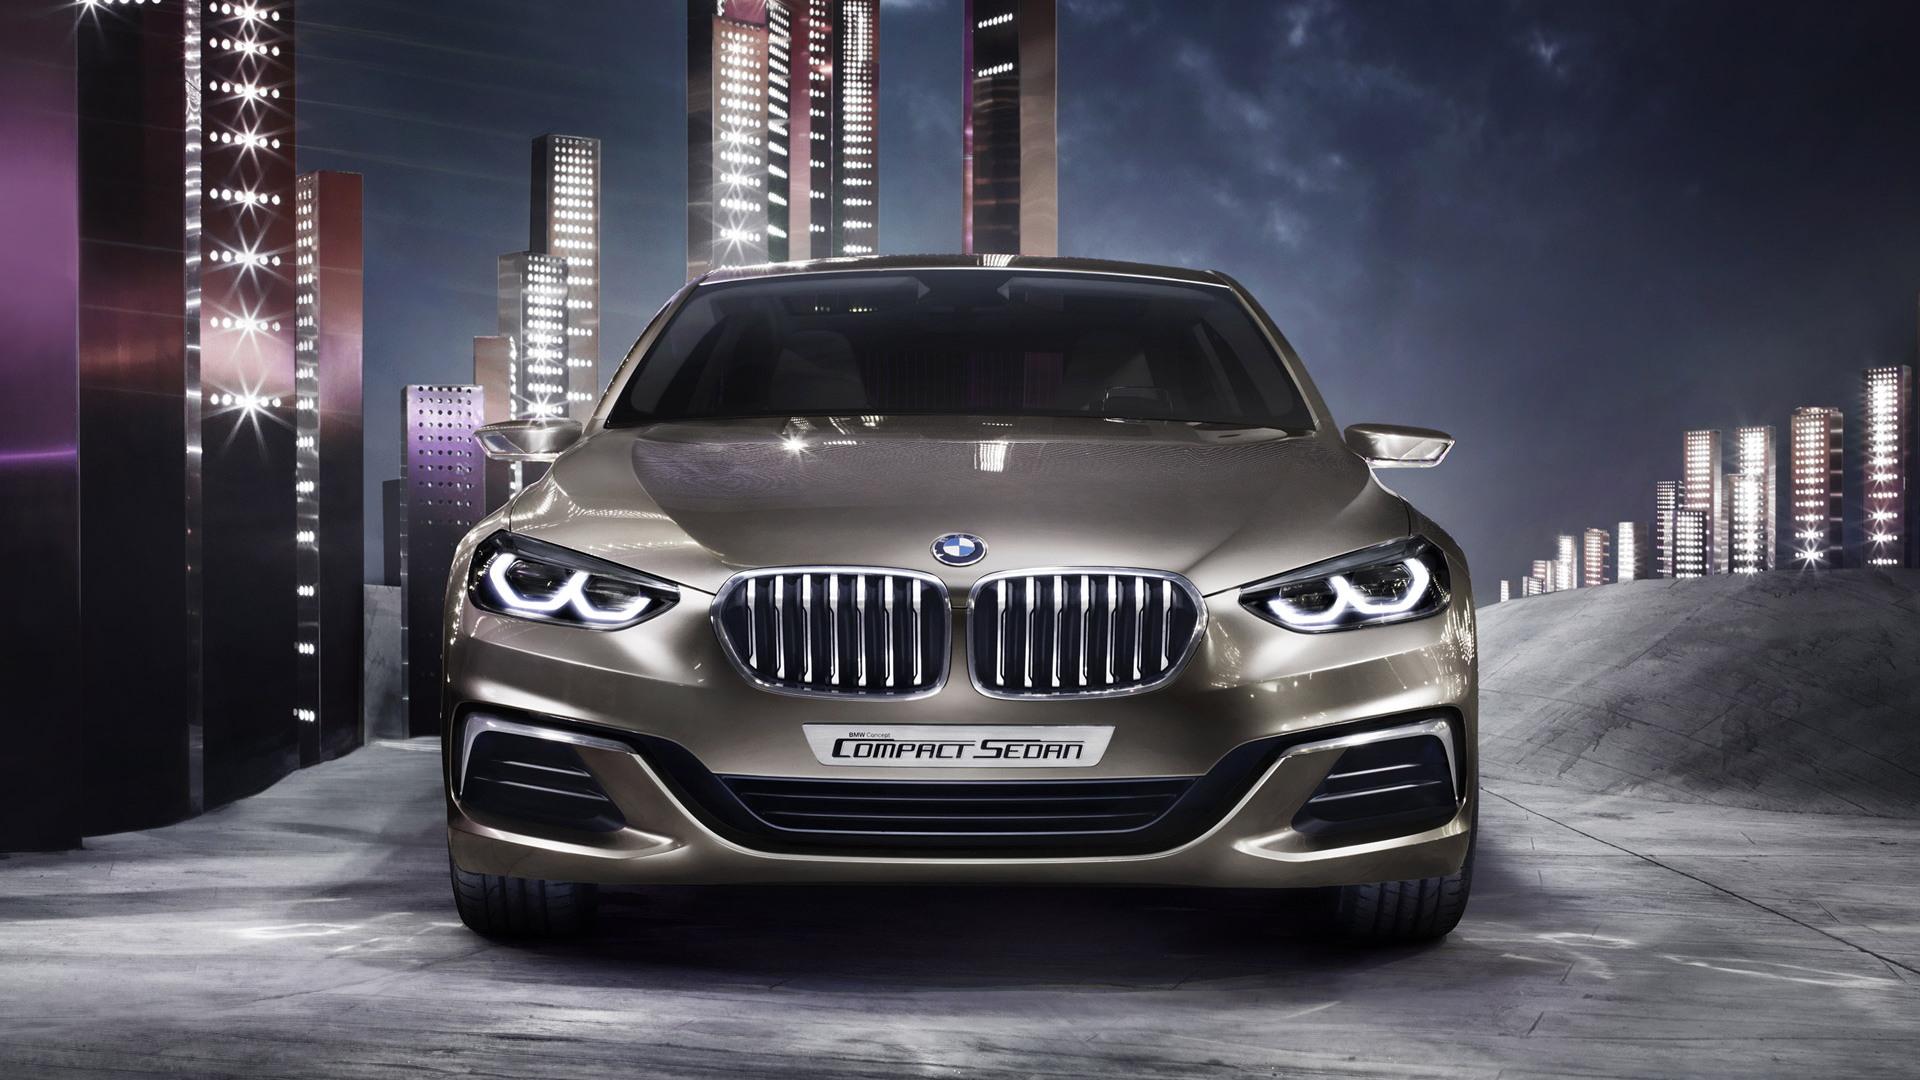 BMW Compact Sedan concept, 2015 Guangzhou Auto Show